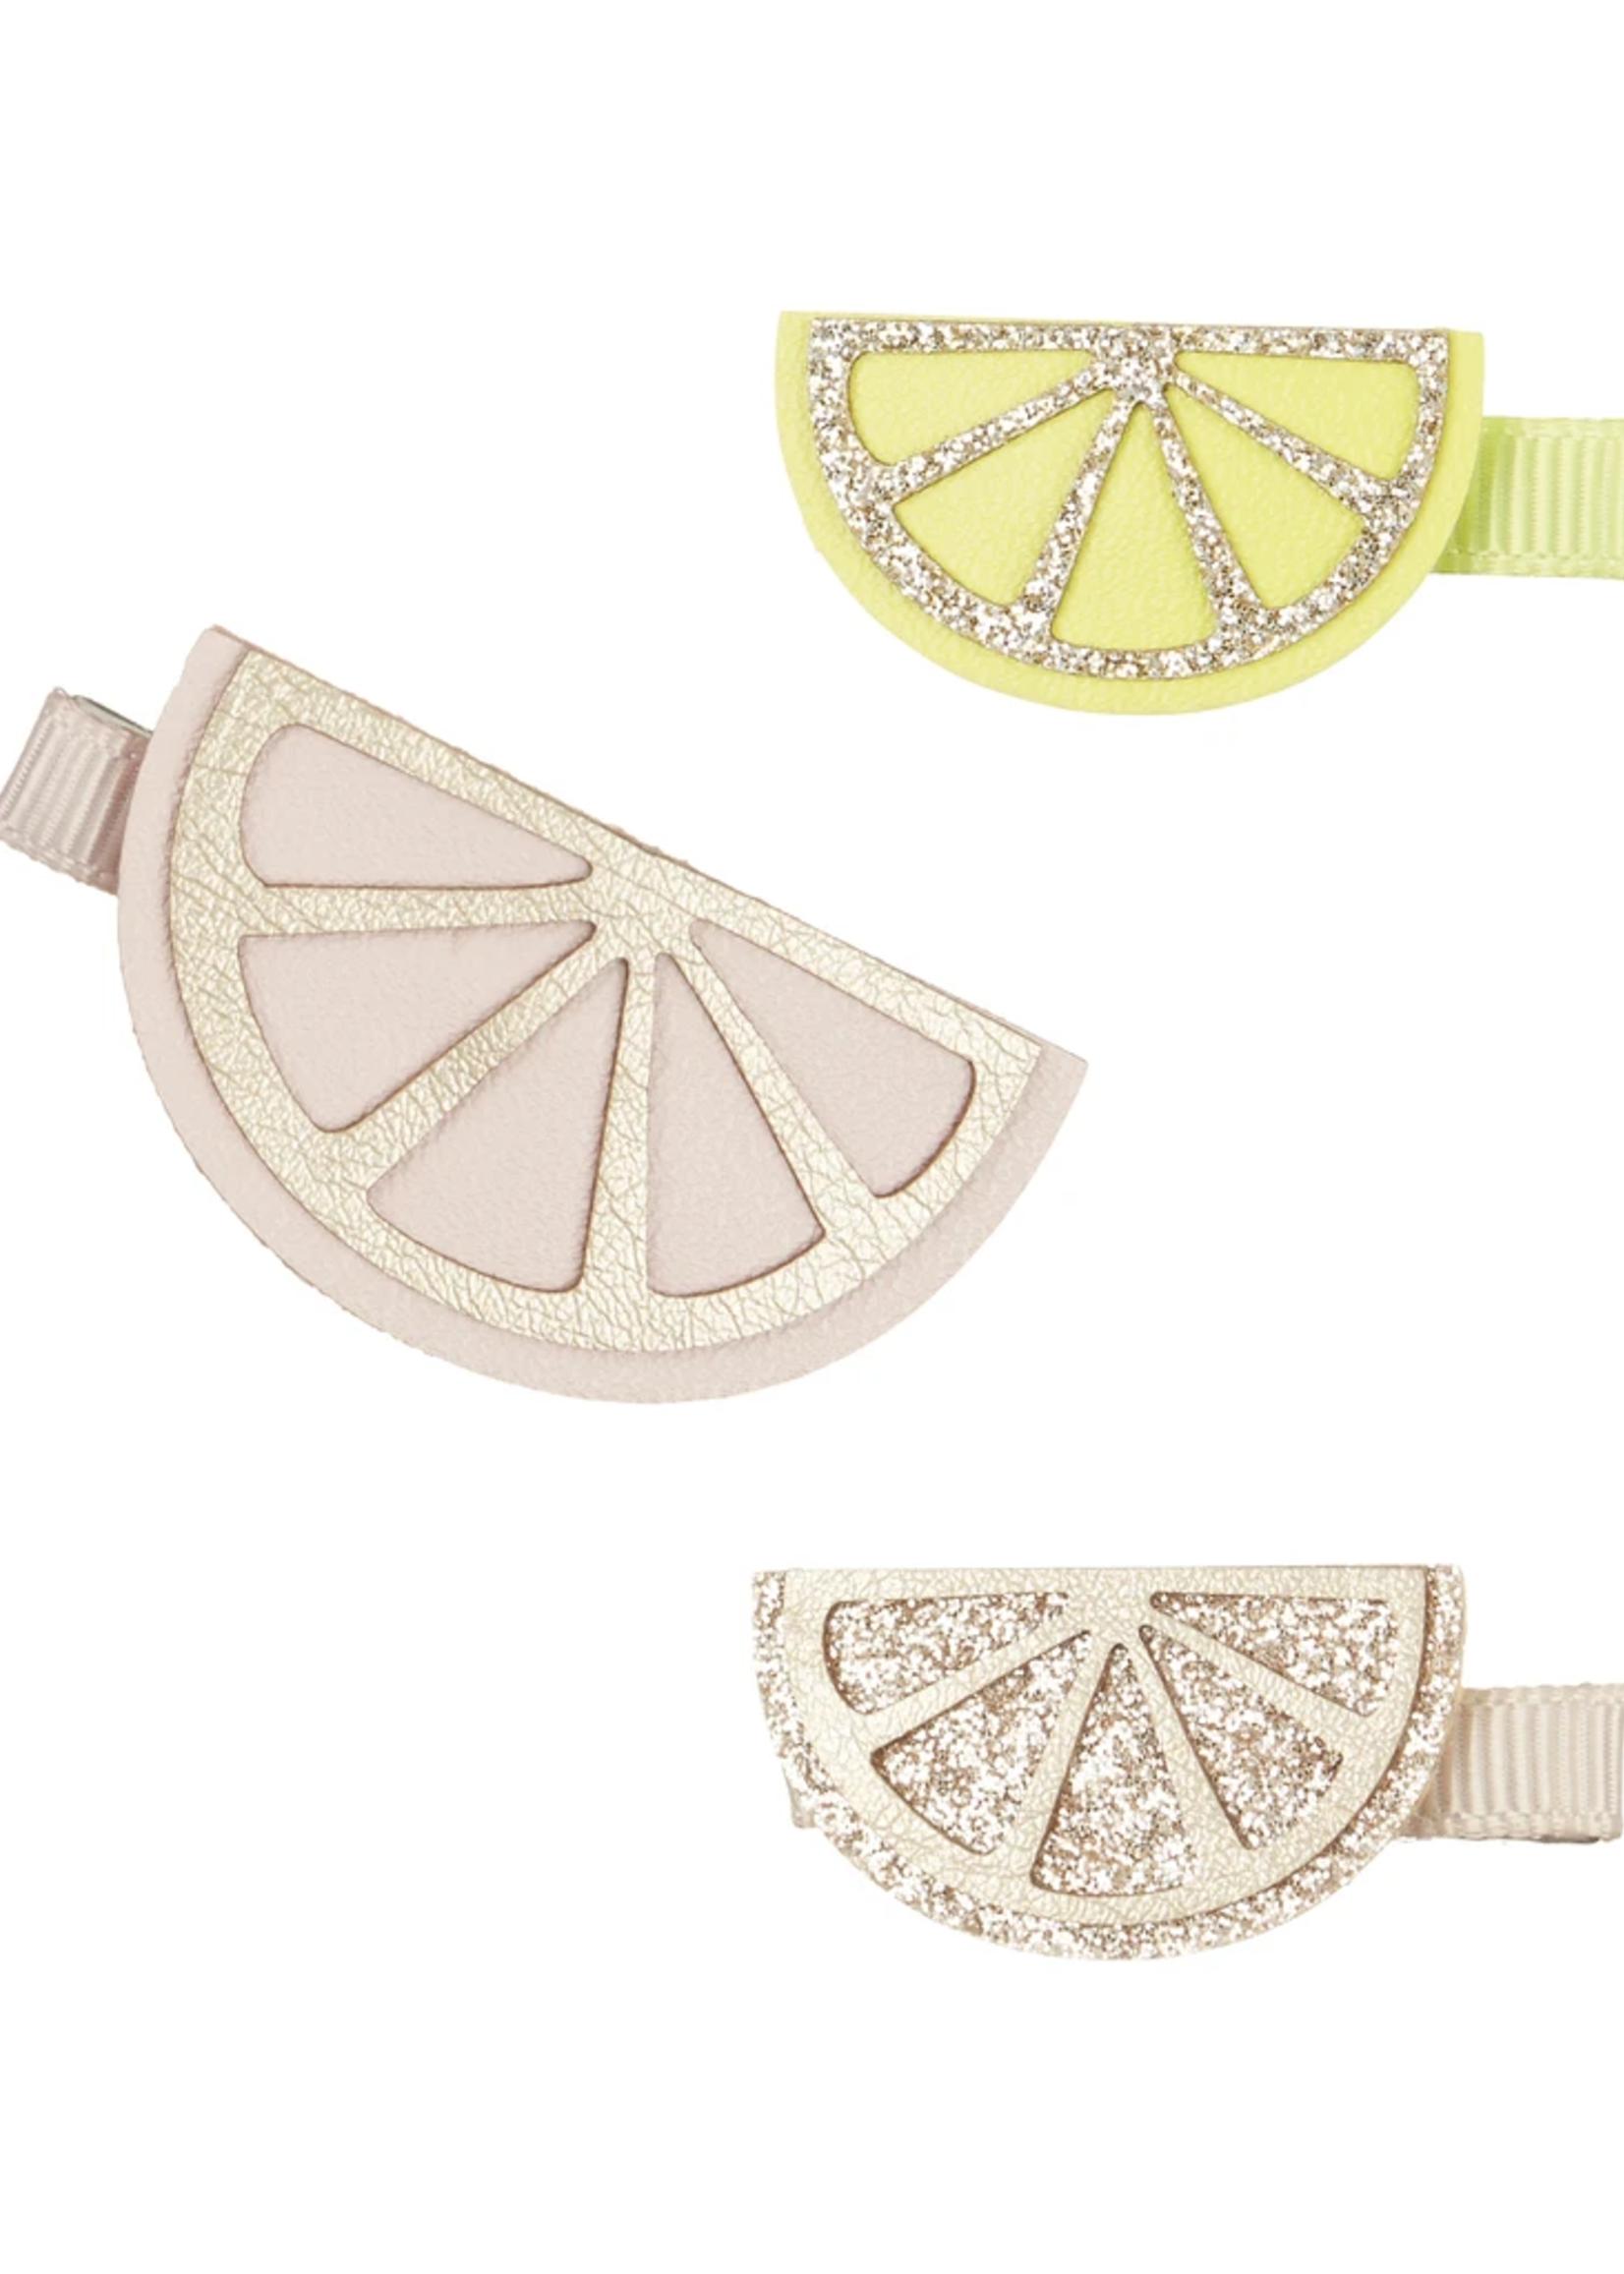 mimi&lula Mimi & Lula Citrus Slice Clips